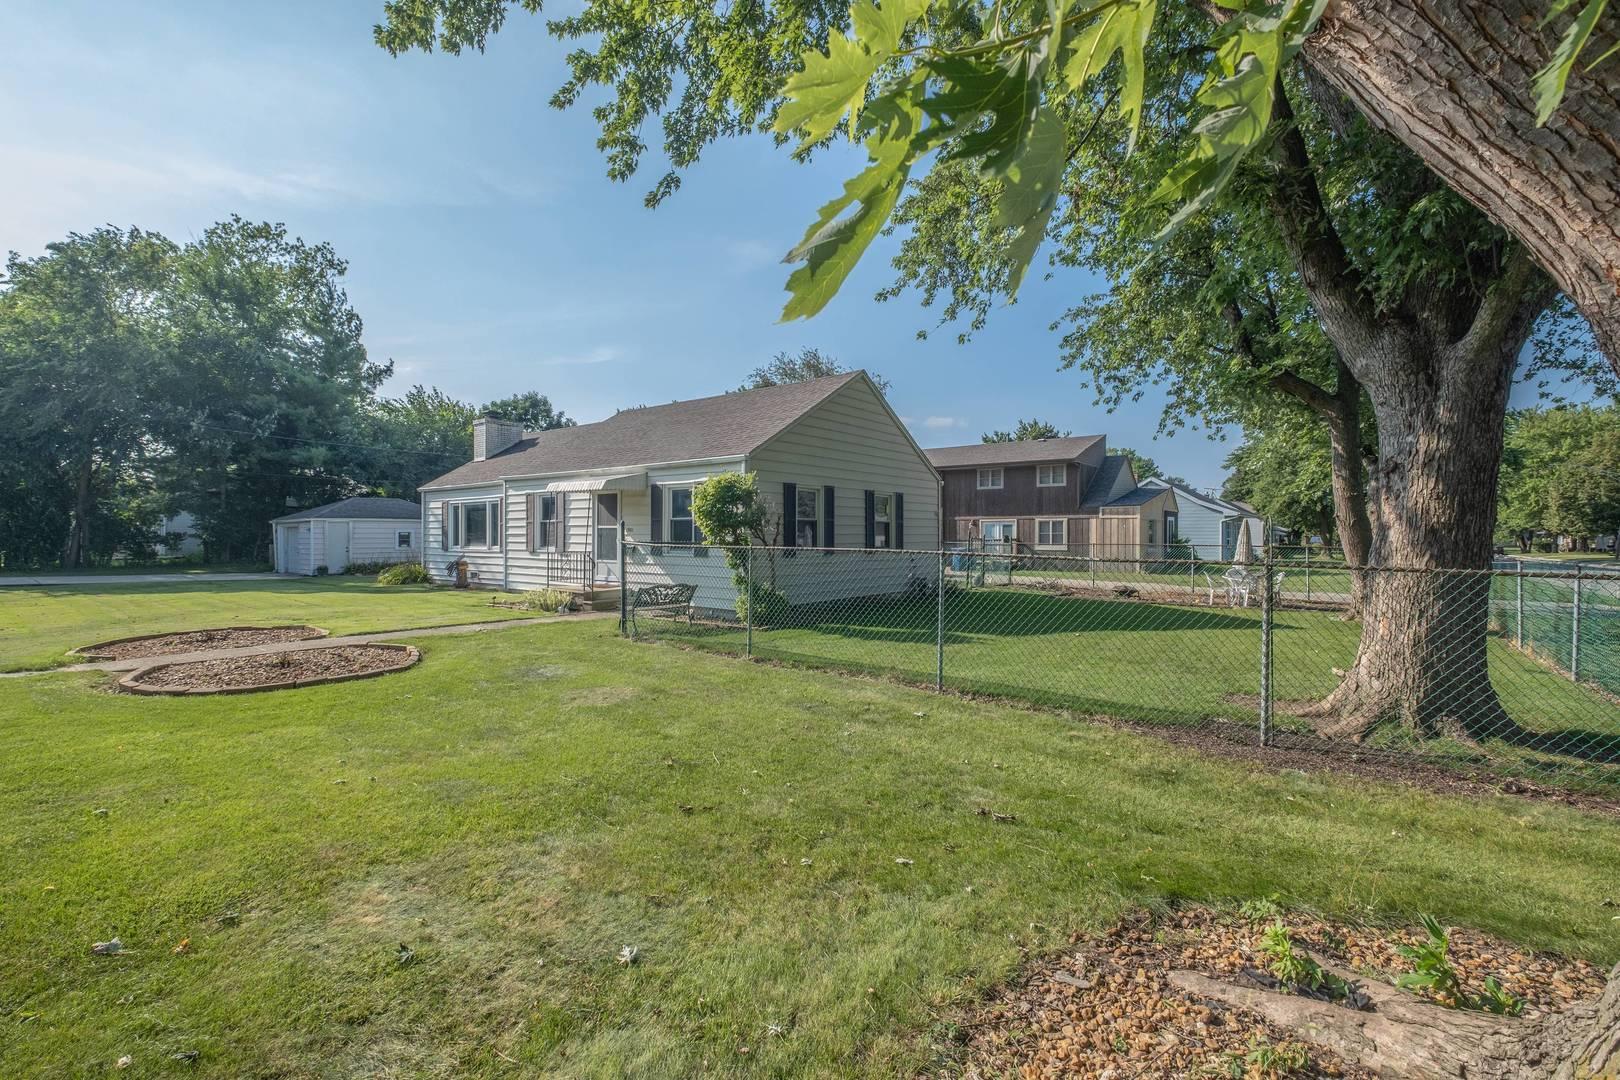 1901 Wilcox, Crest Hill, Illinois, 60403